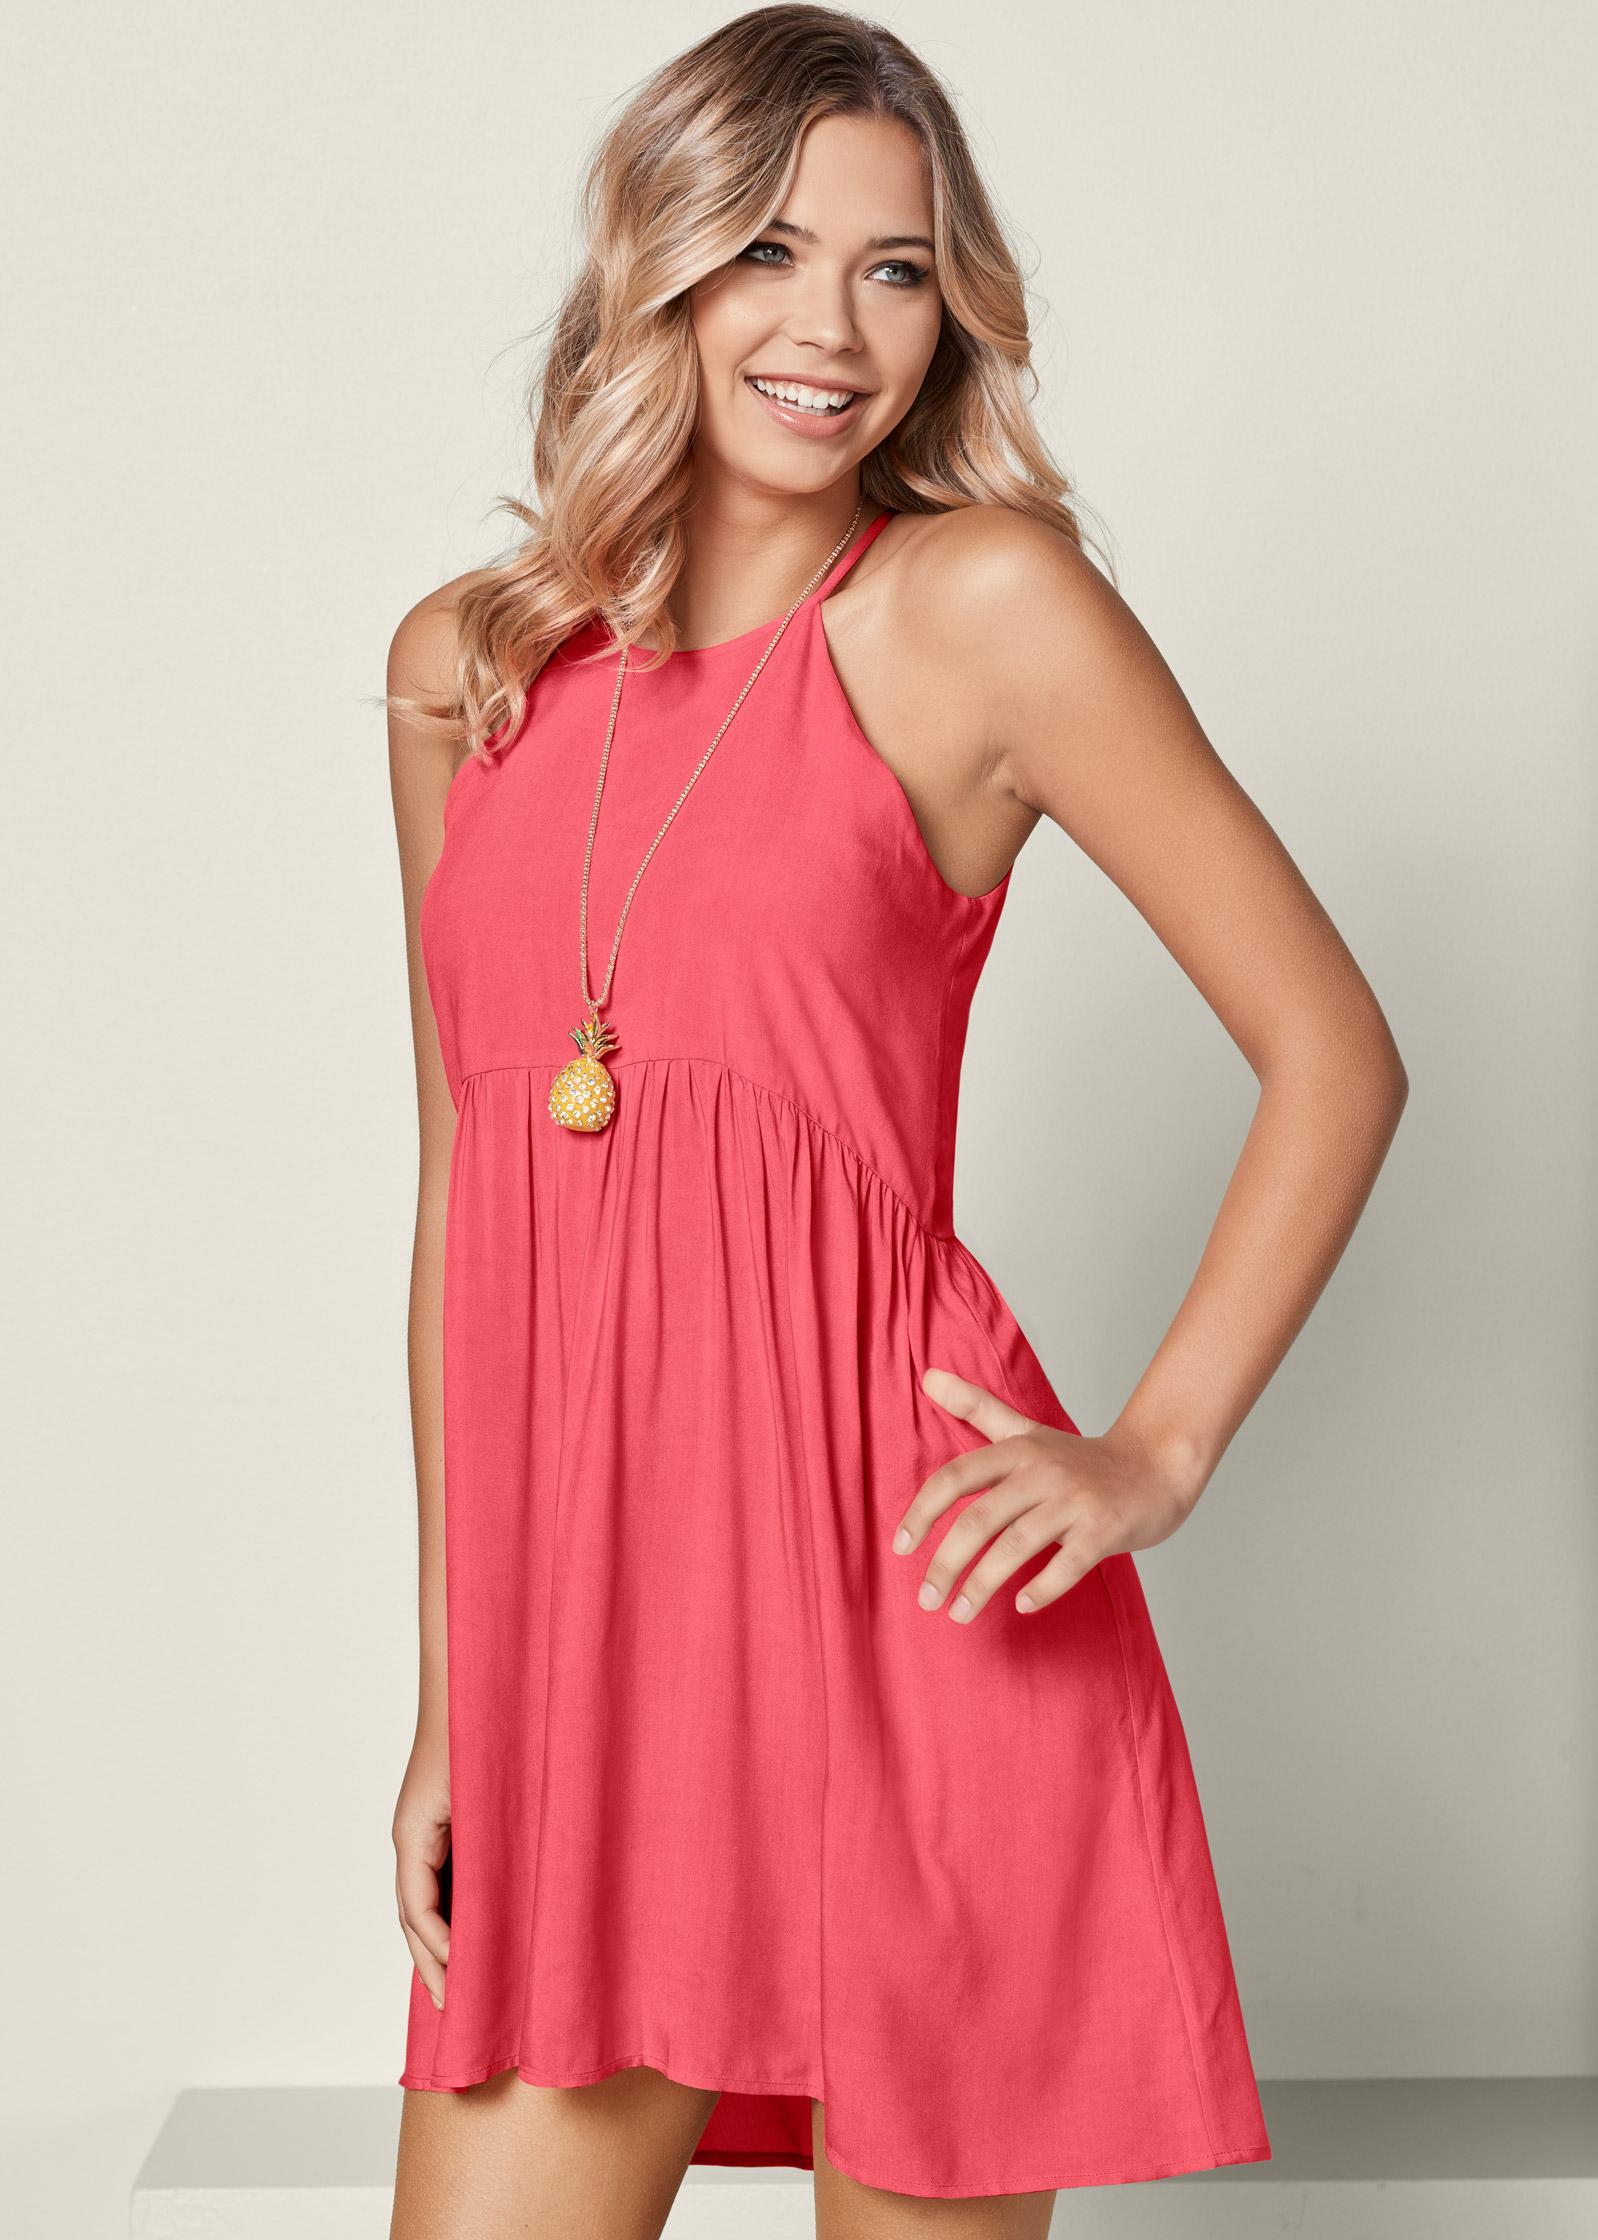 Low Mini Dresses